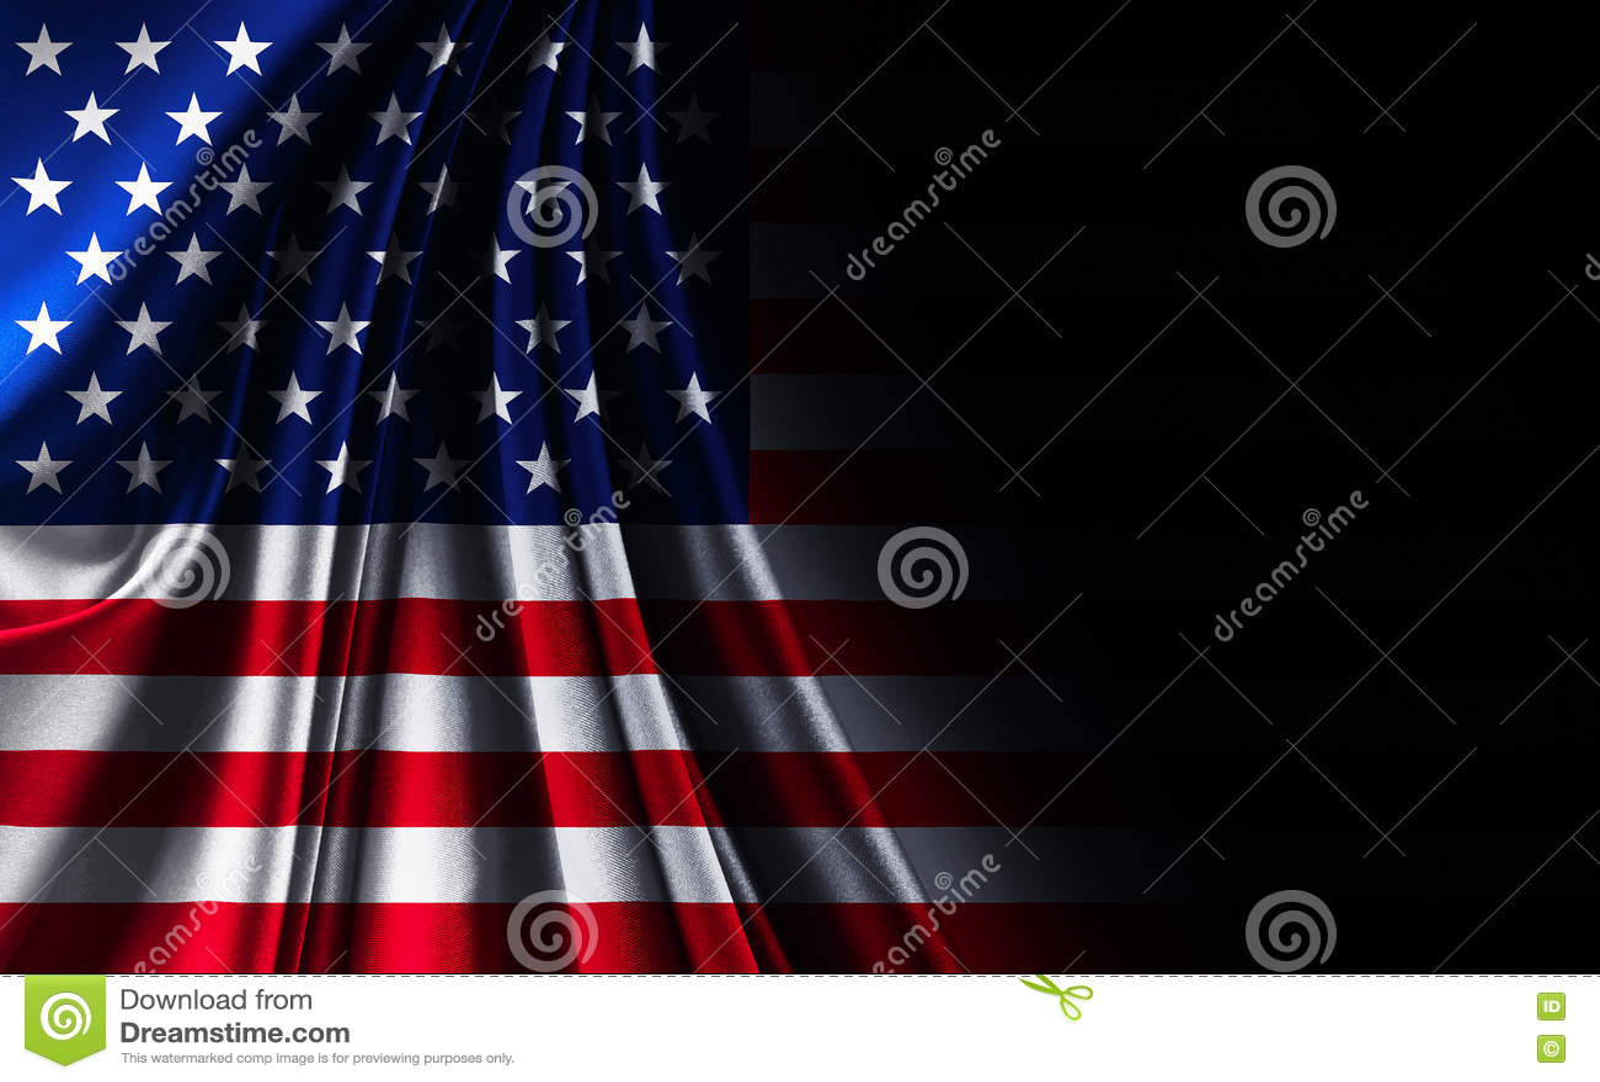 Fabric texture American USA flag, on black noir background